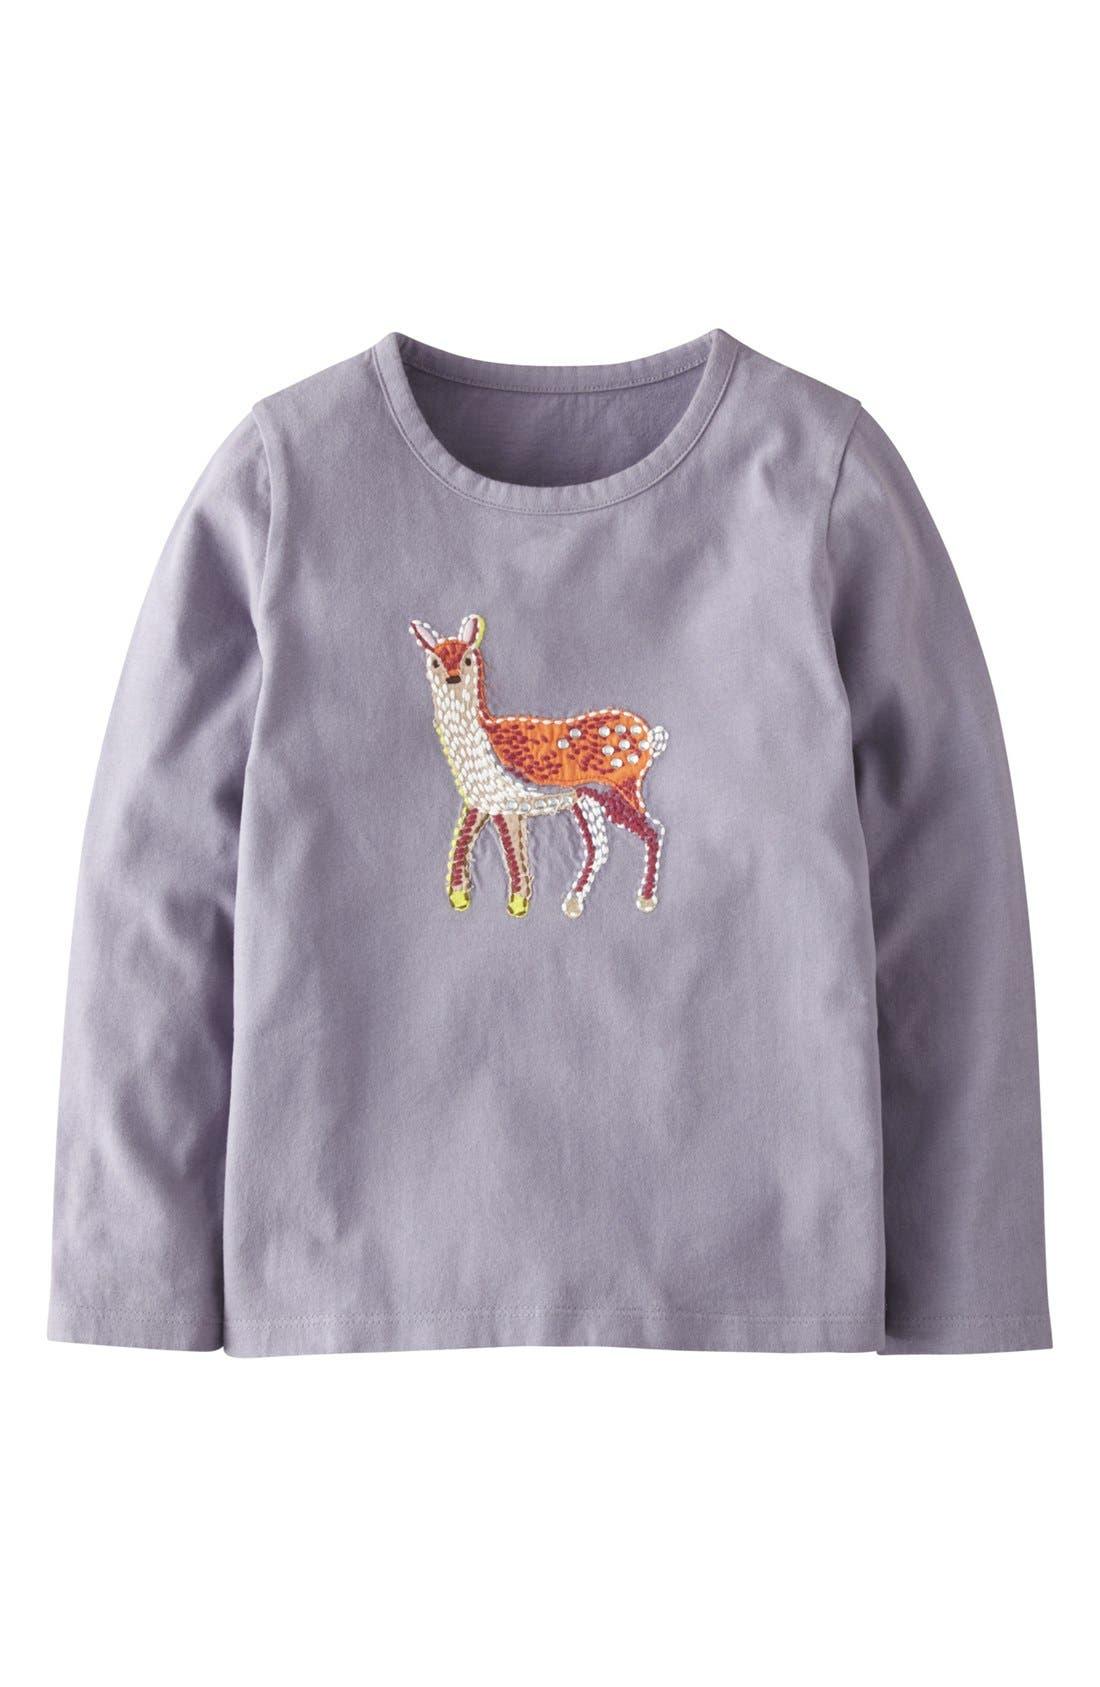 Main Image - Mini Boden 'Woodland' Appliqué Long Sleeve Tee (Toddler Girls, Little Girls & Big Girls)